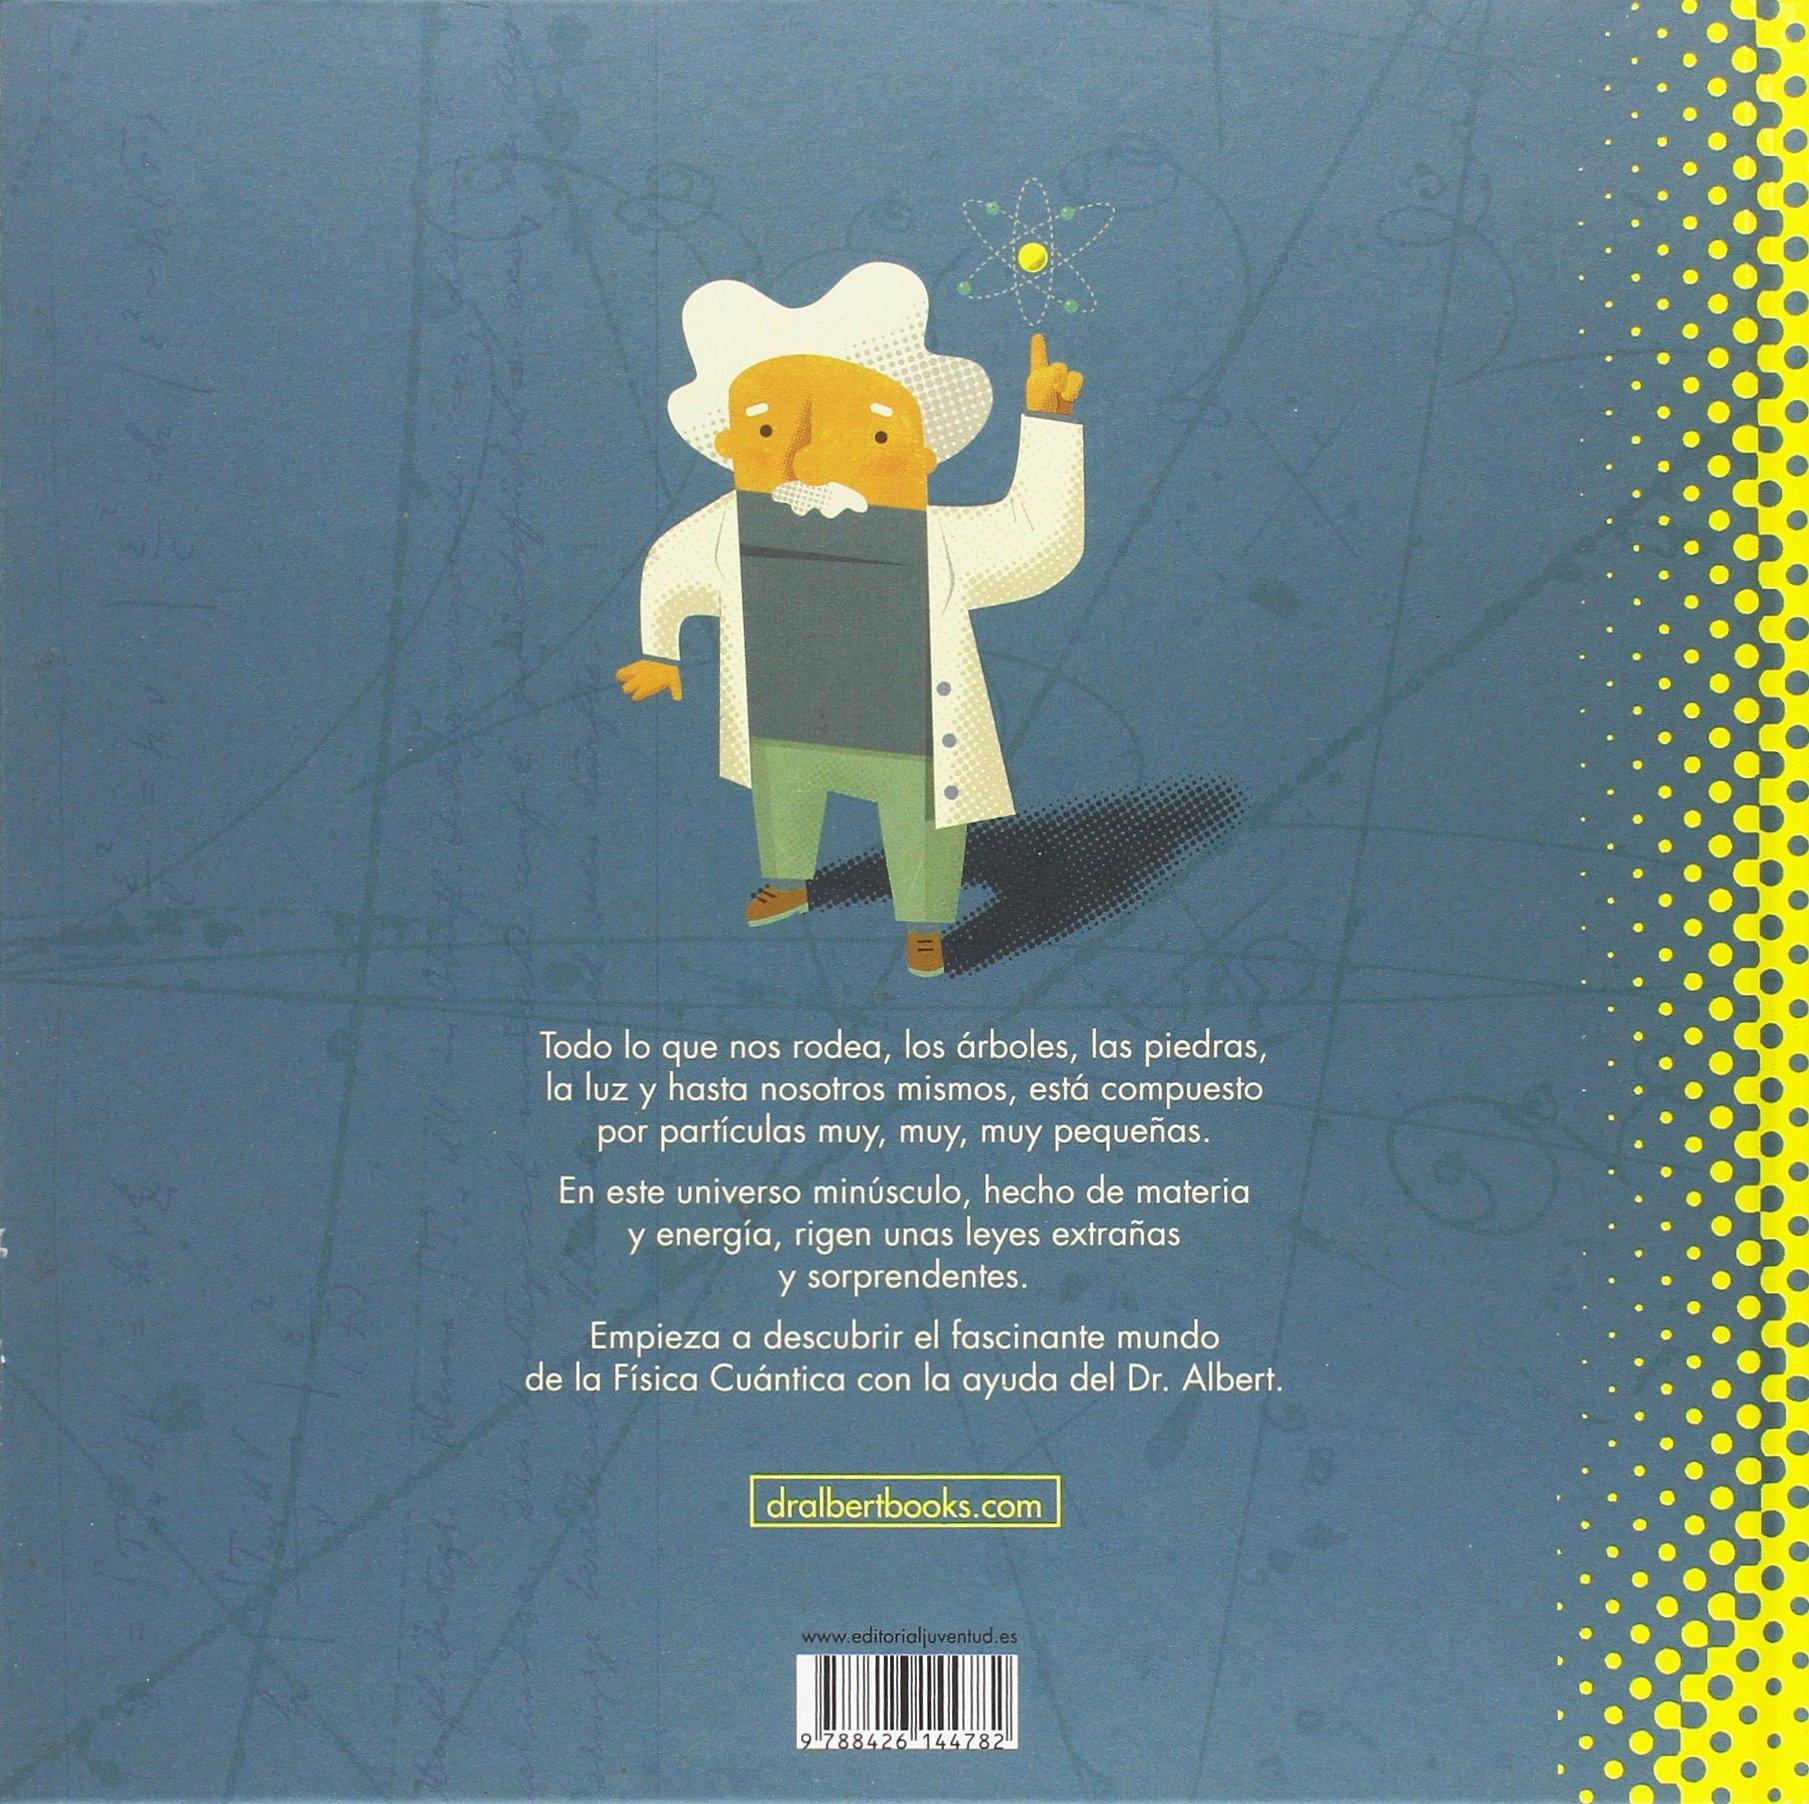 Mi Primer Libro de Fisica Cuantica (Spanish Edition)